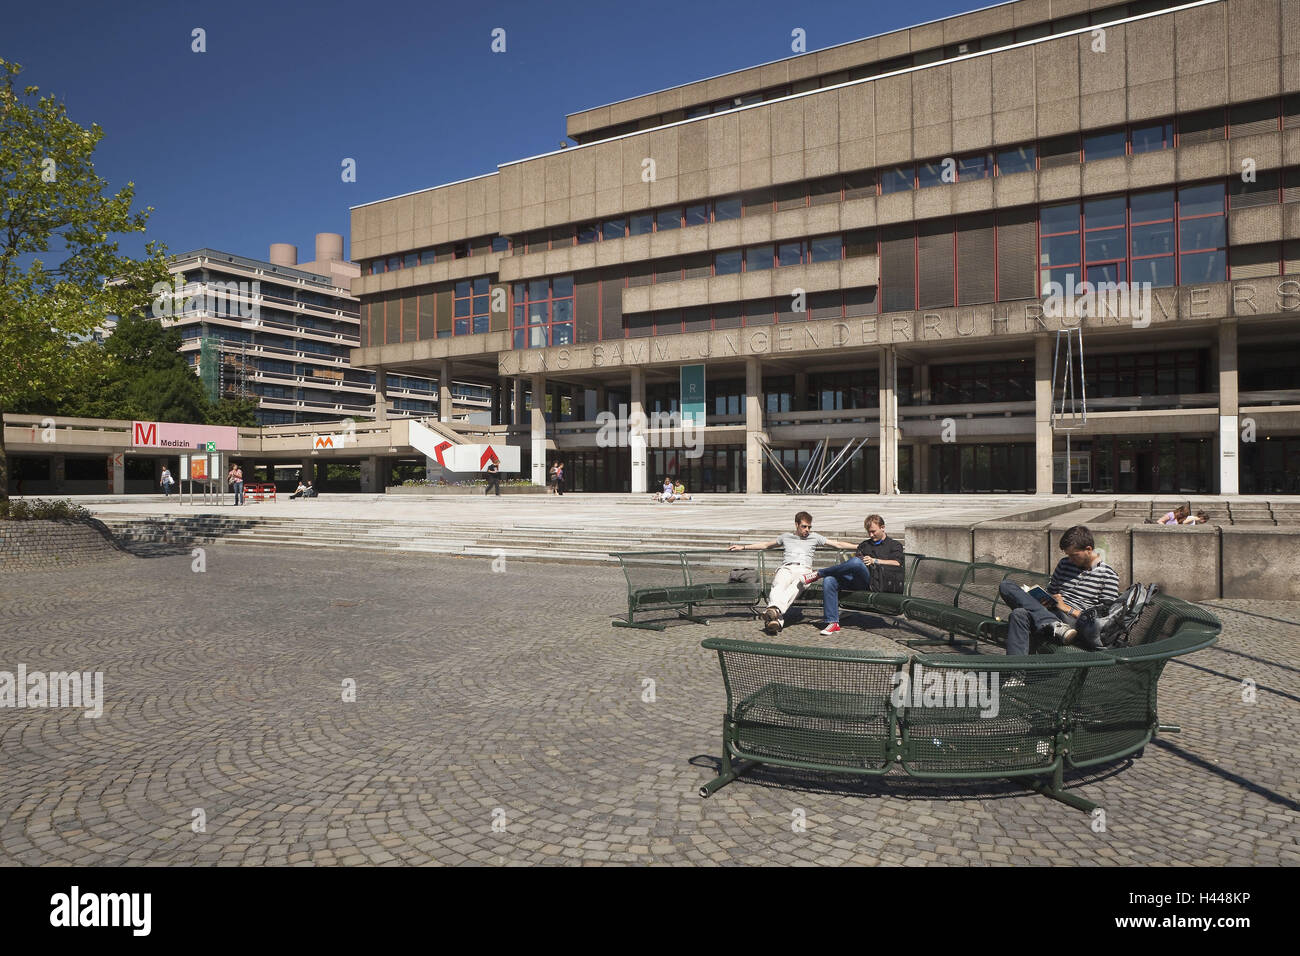 Germany, North Rhine-Westphalia, Bochum, Ruhr (region) university, - Stock Image